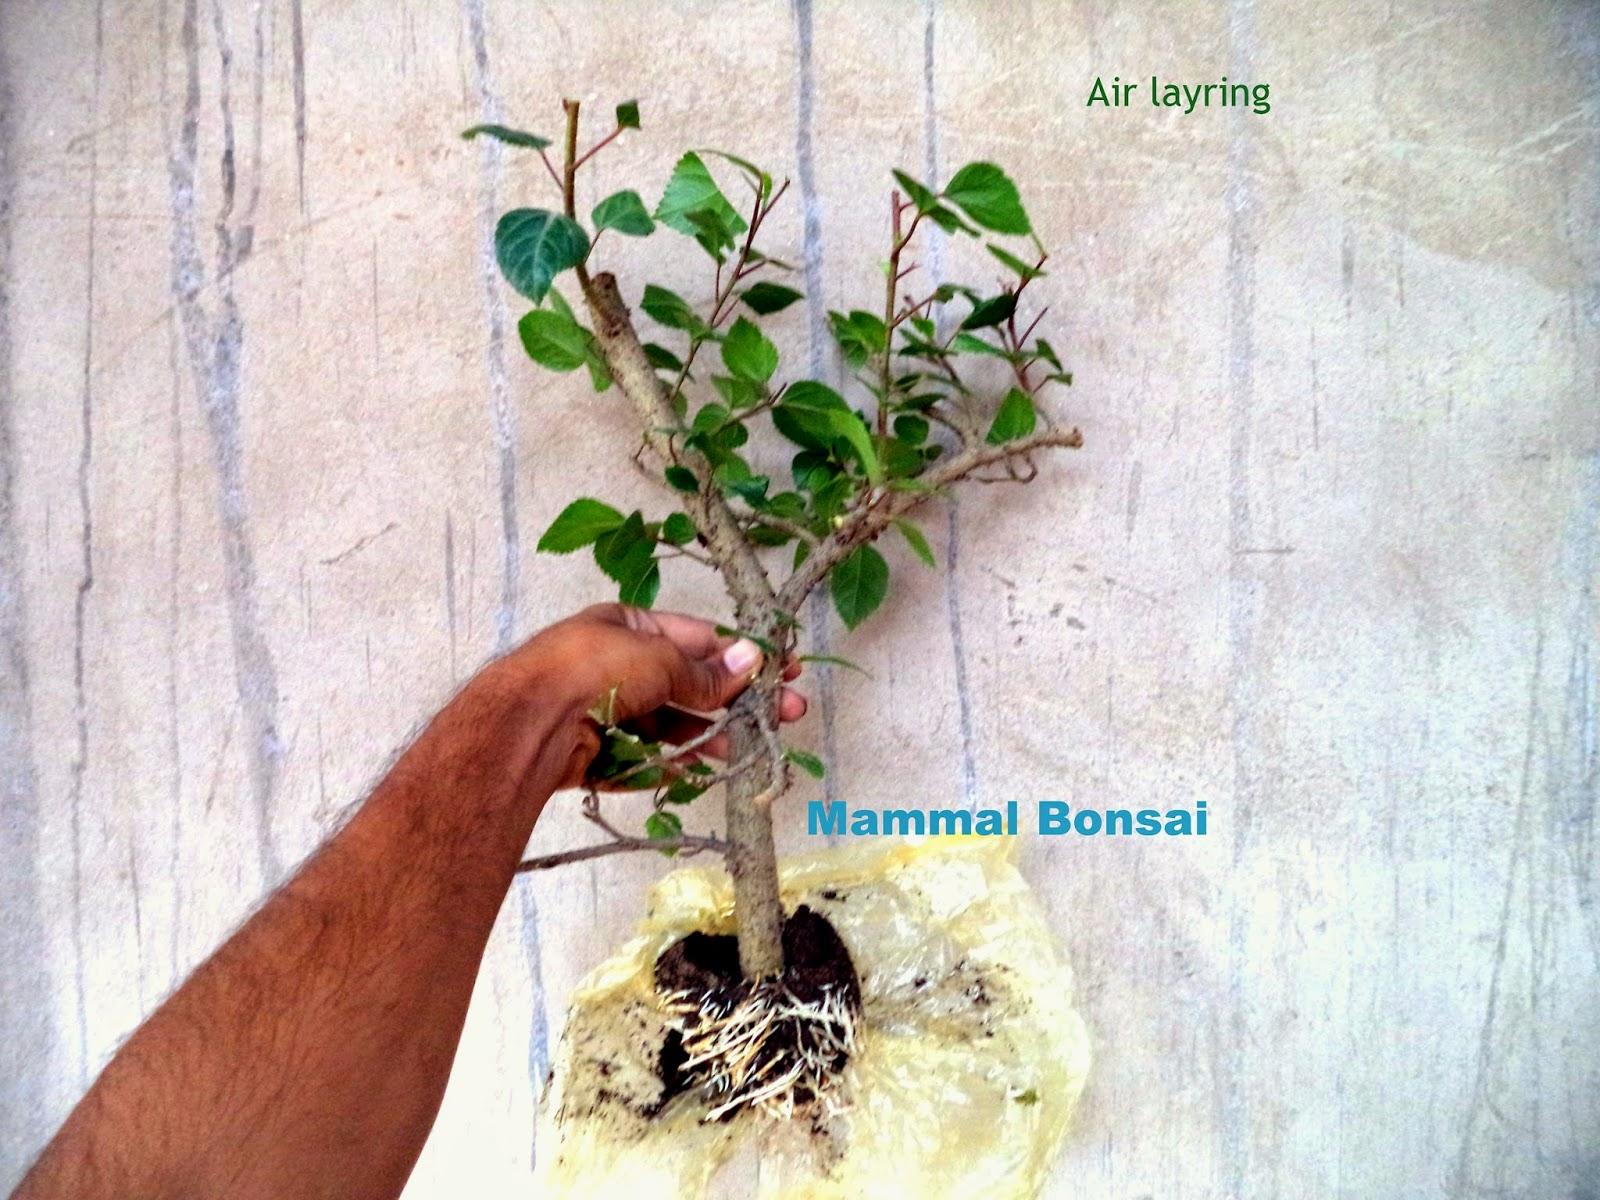 Mammal Bonsai Hibiscus Air Layering